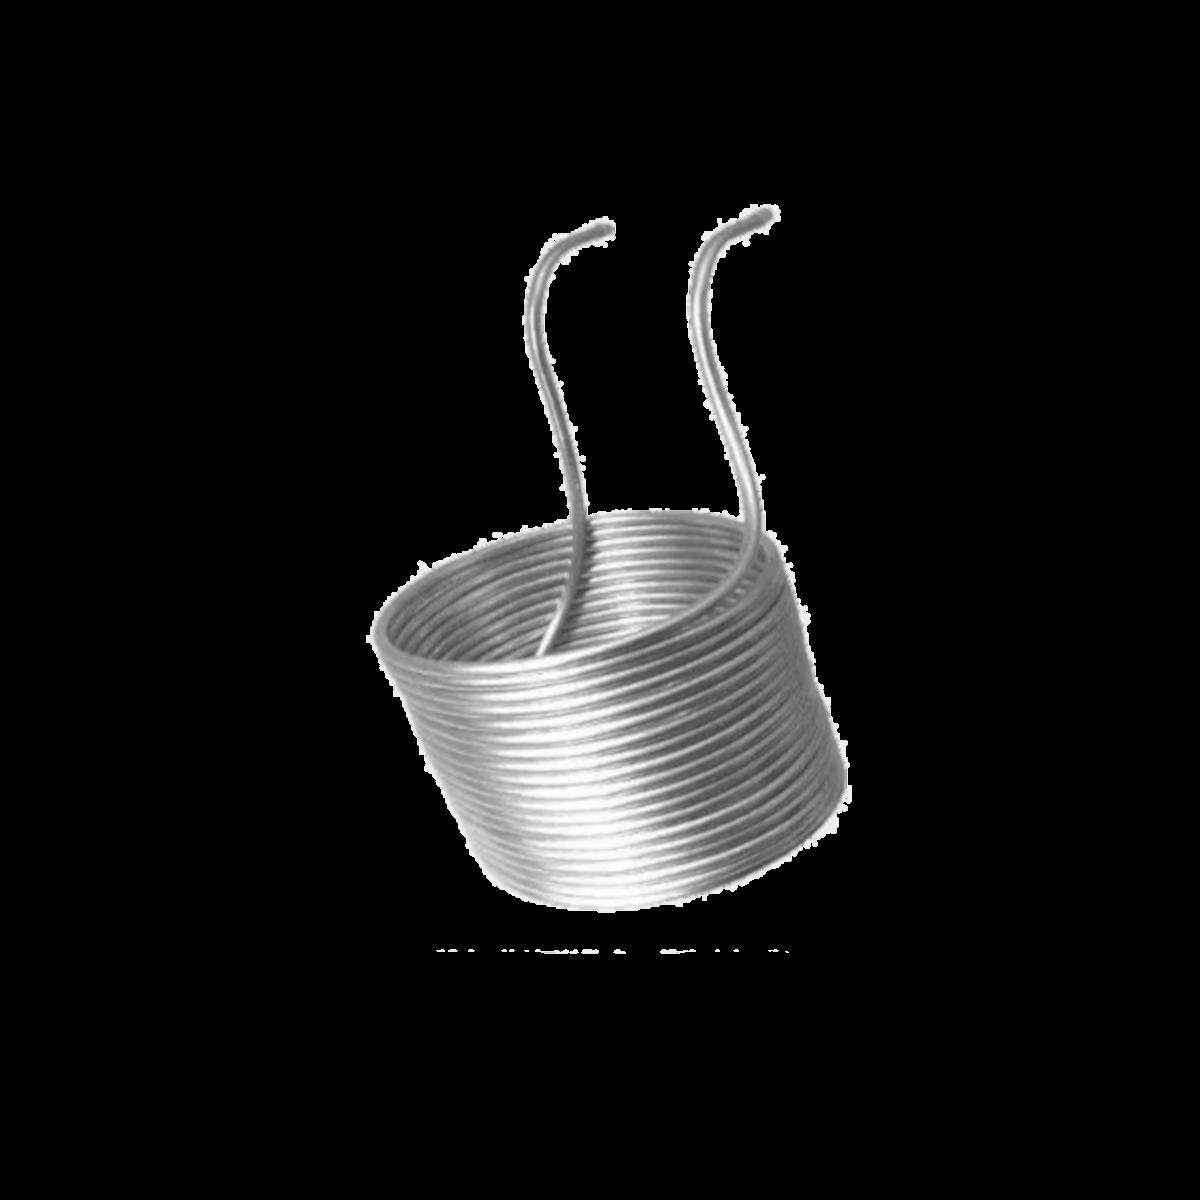 Chiller De Imersão Alumínio 30cm - 15Mts